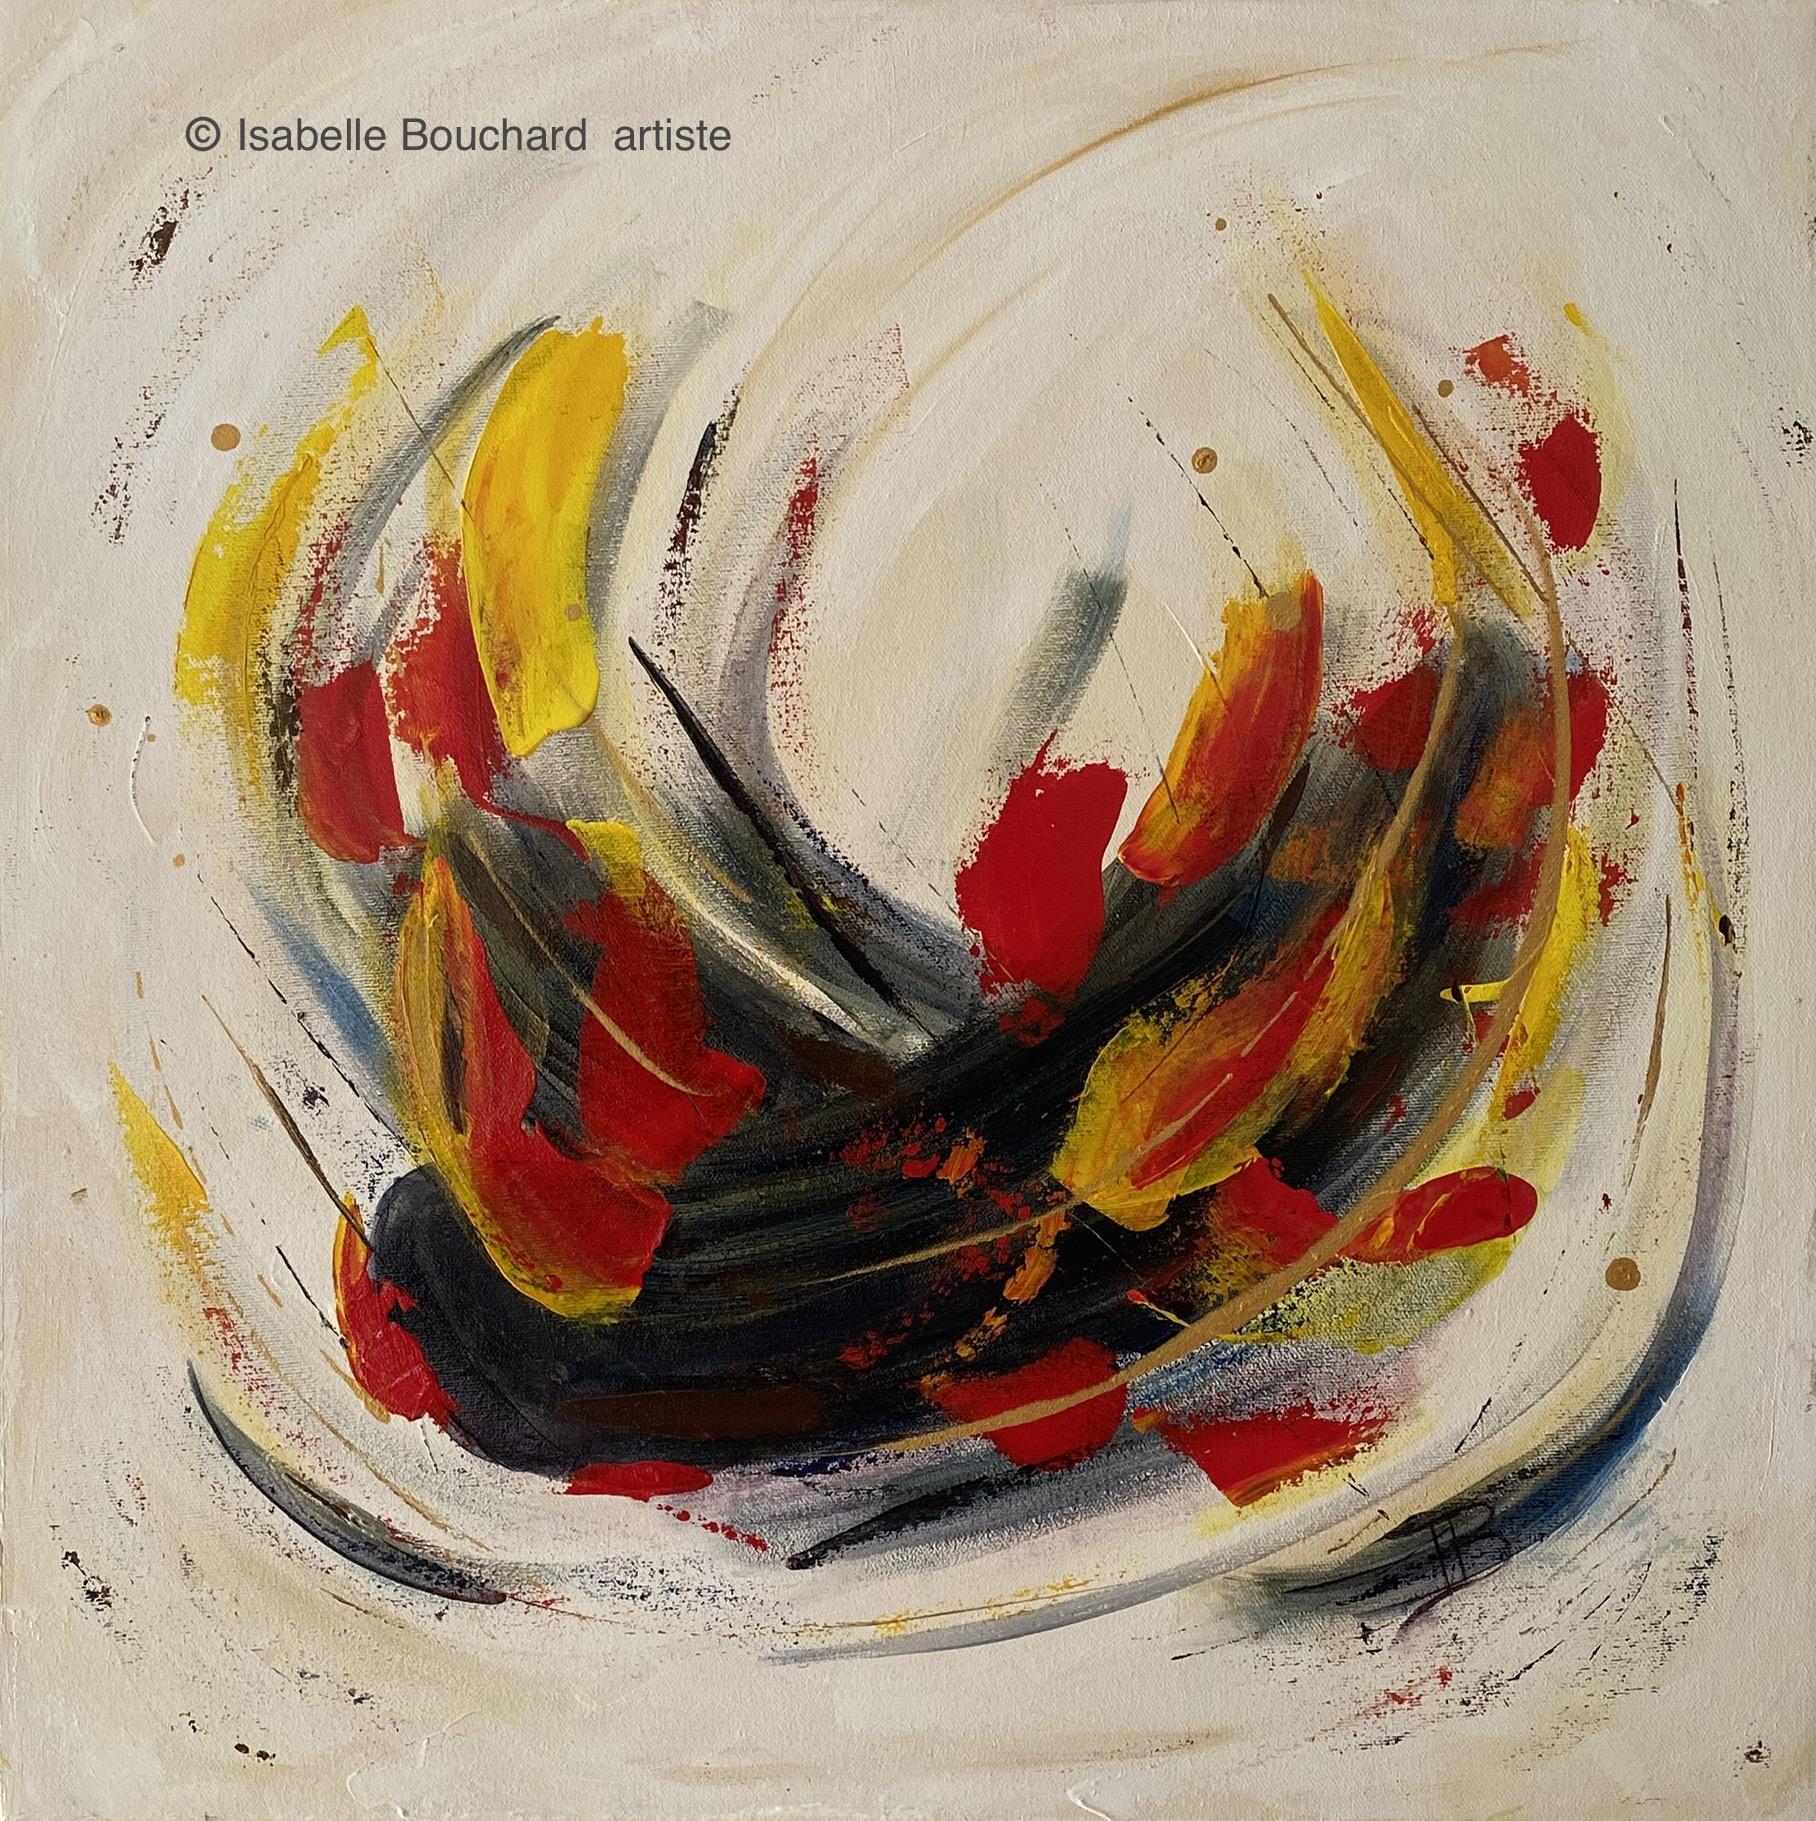 Isabelle Bouchard artiste Passion